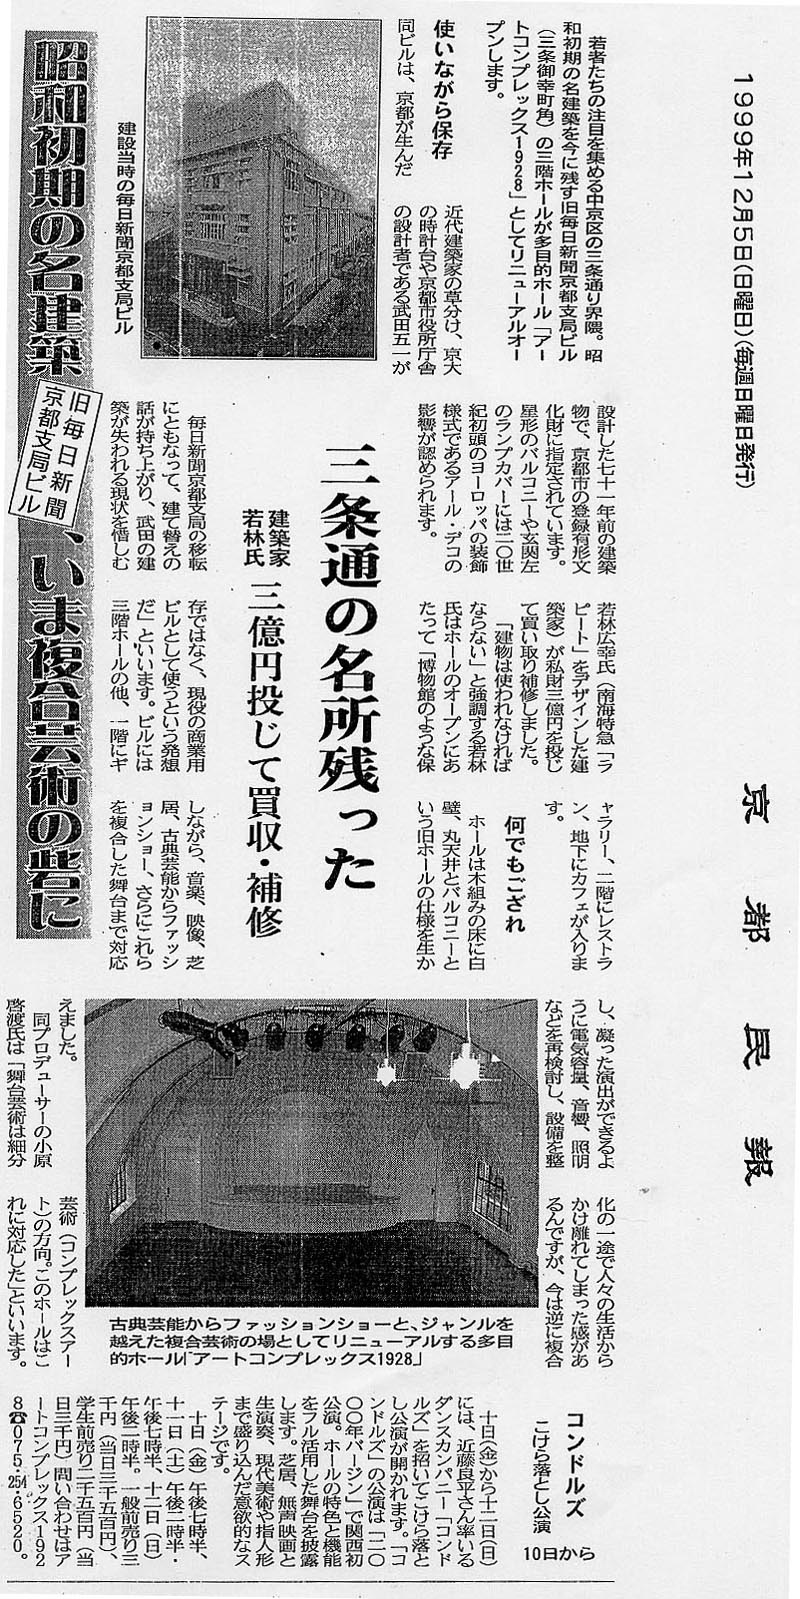 20070105-kyotominpou19991205.jpg